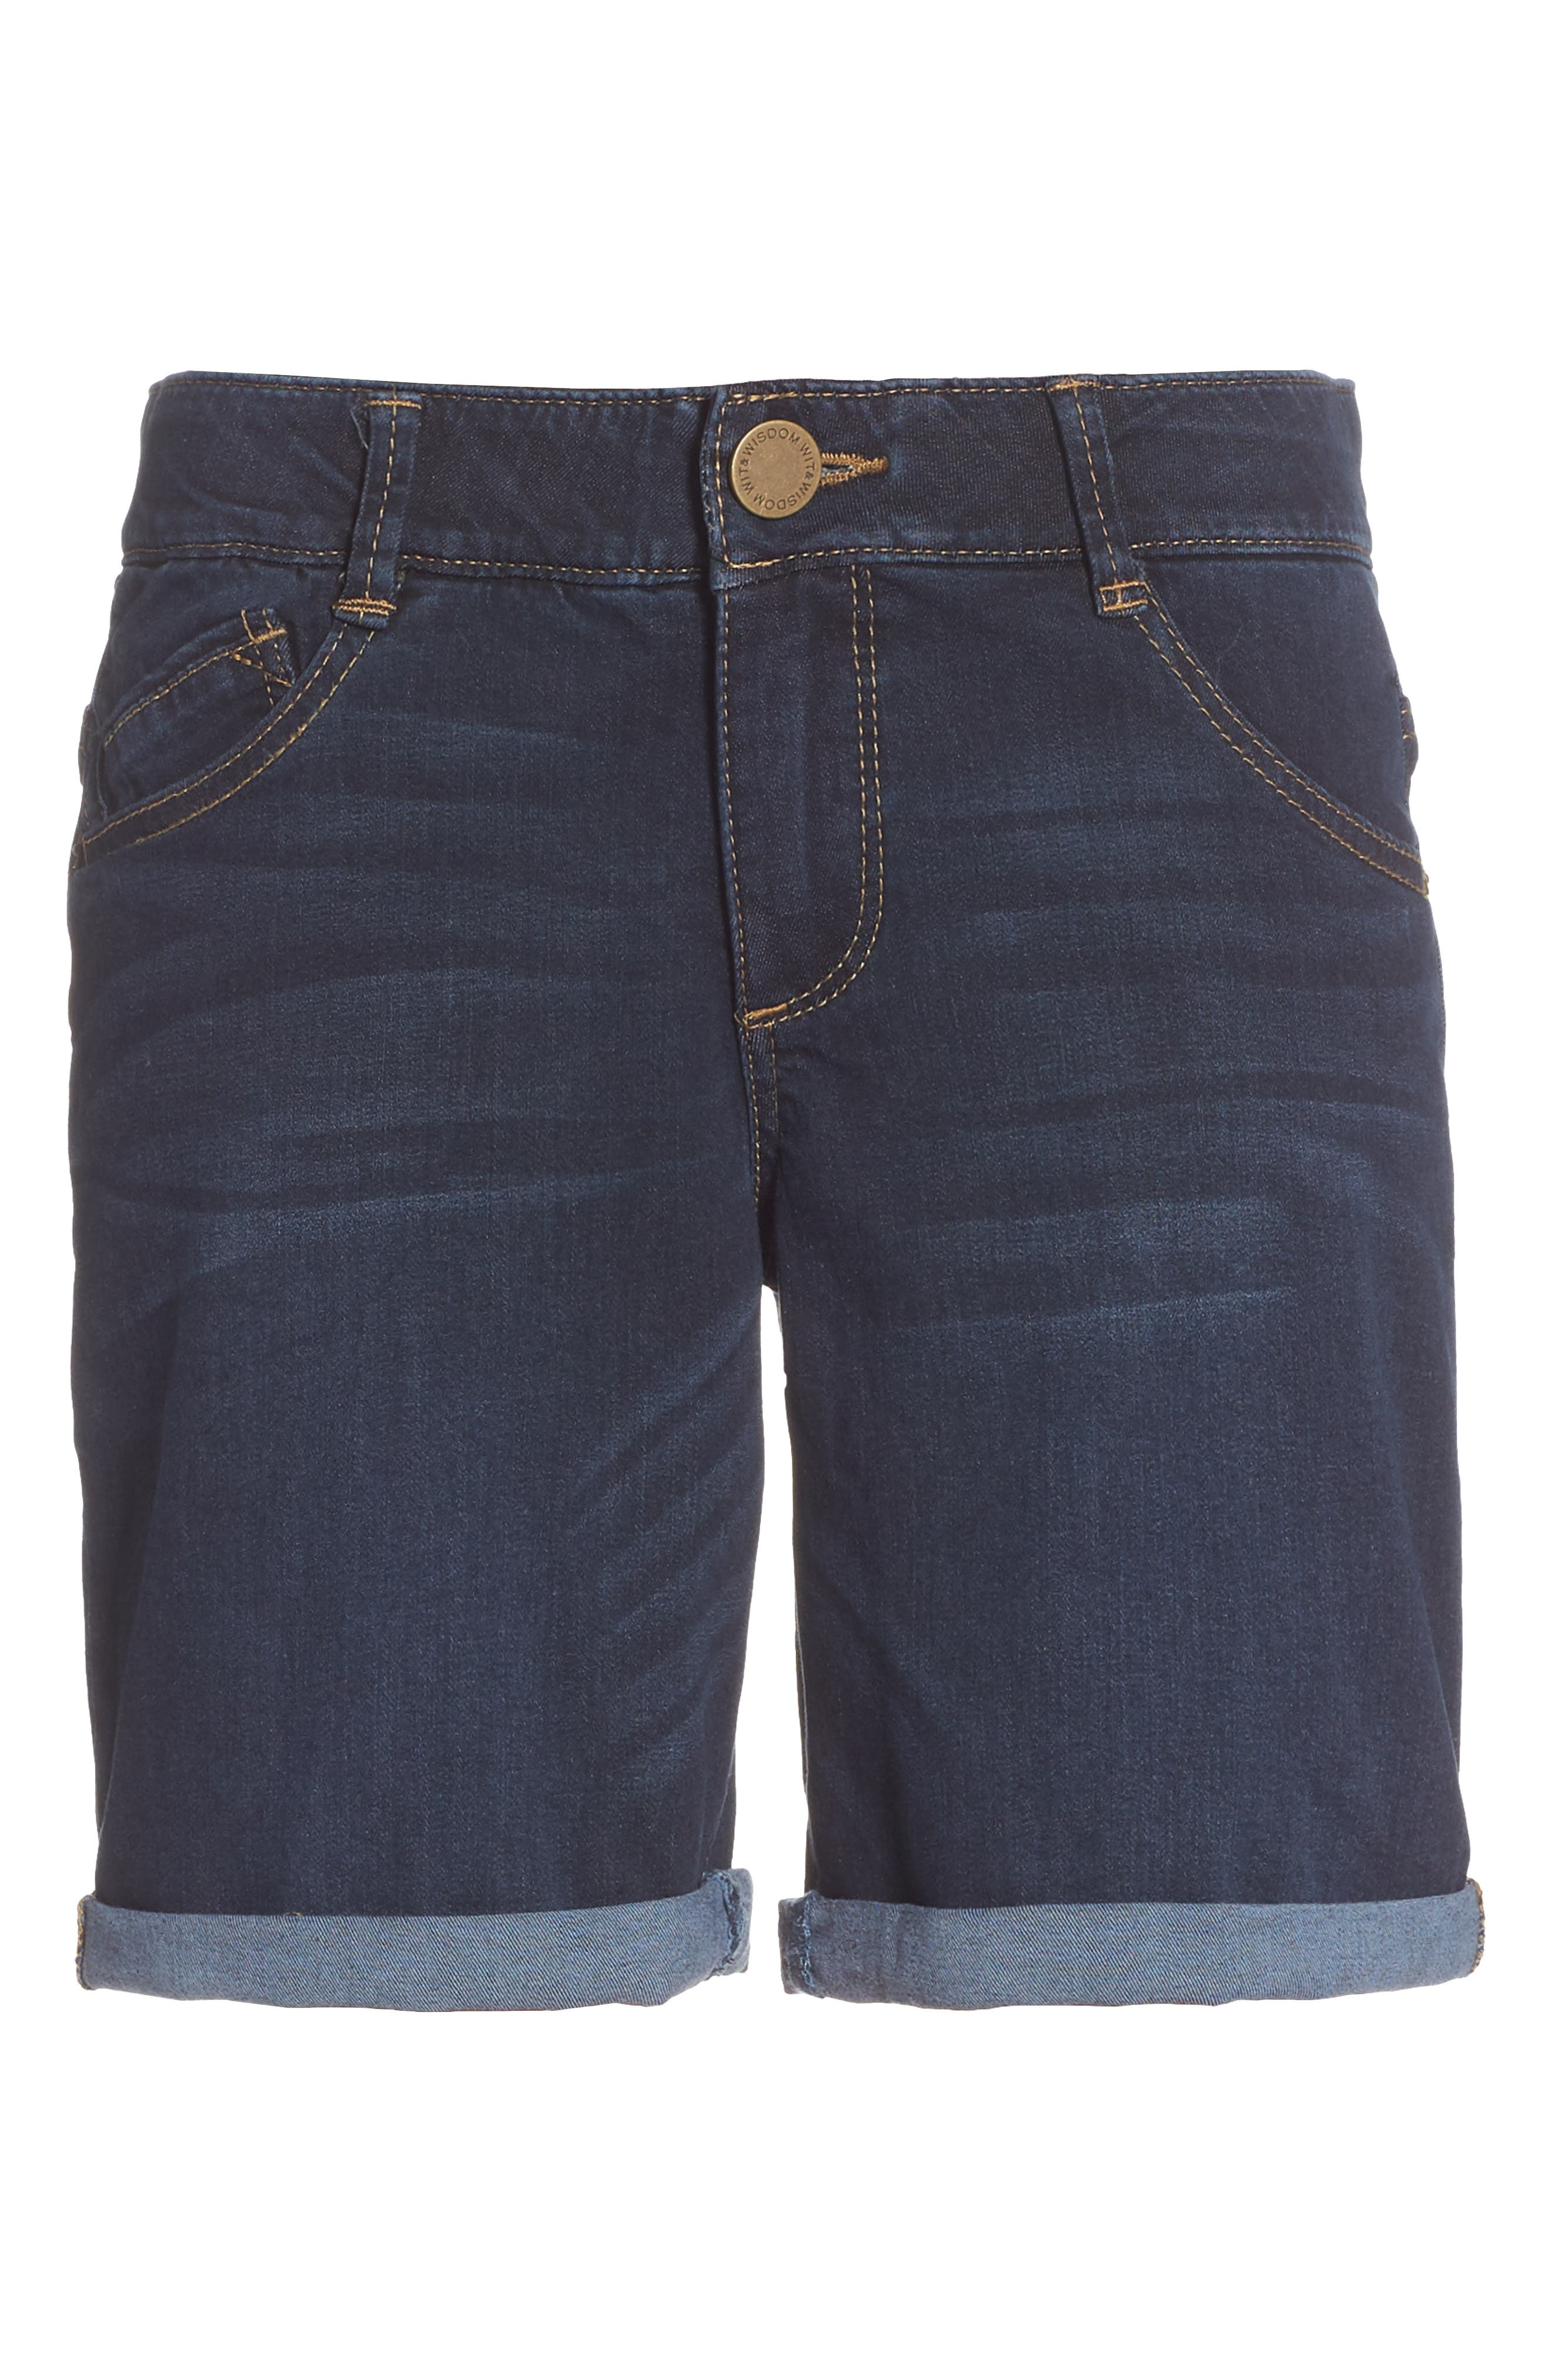 Ab-solution Cuffed Denim Shorts,                             Alternate thumbnail 6, color,